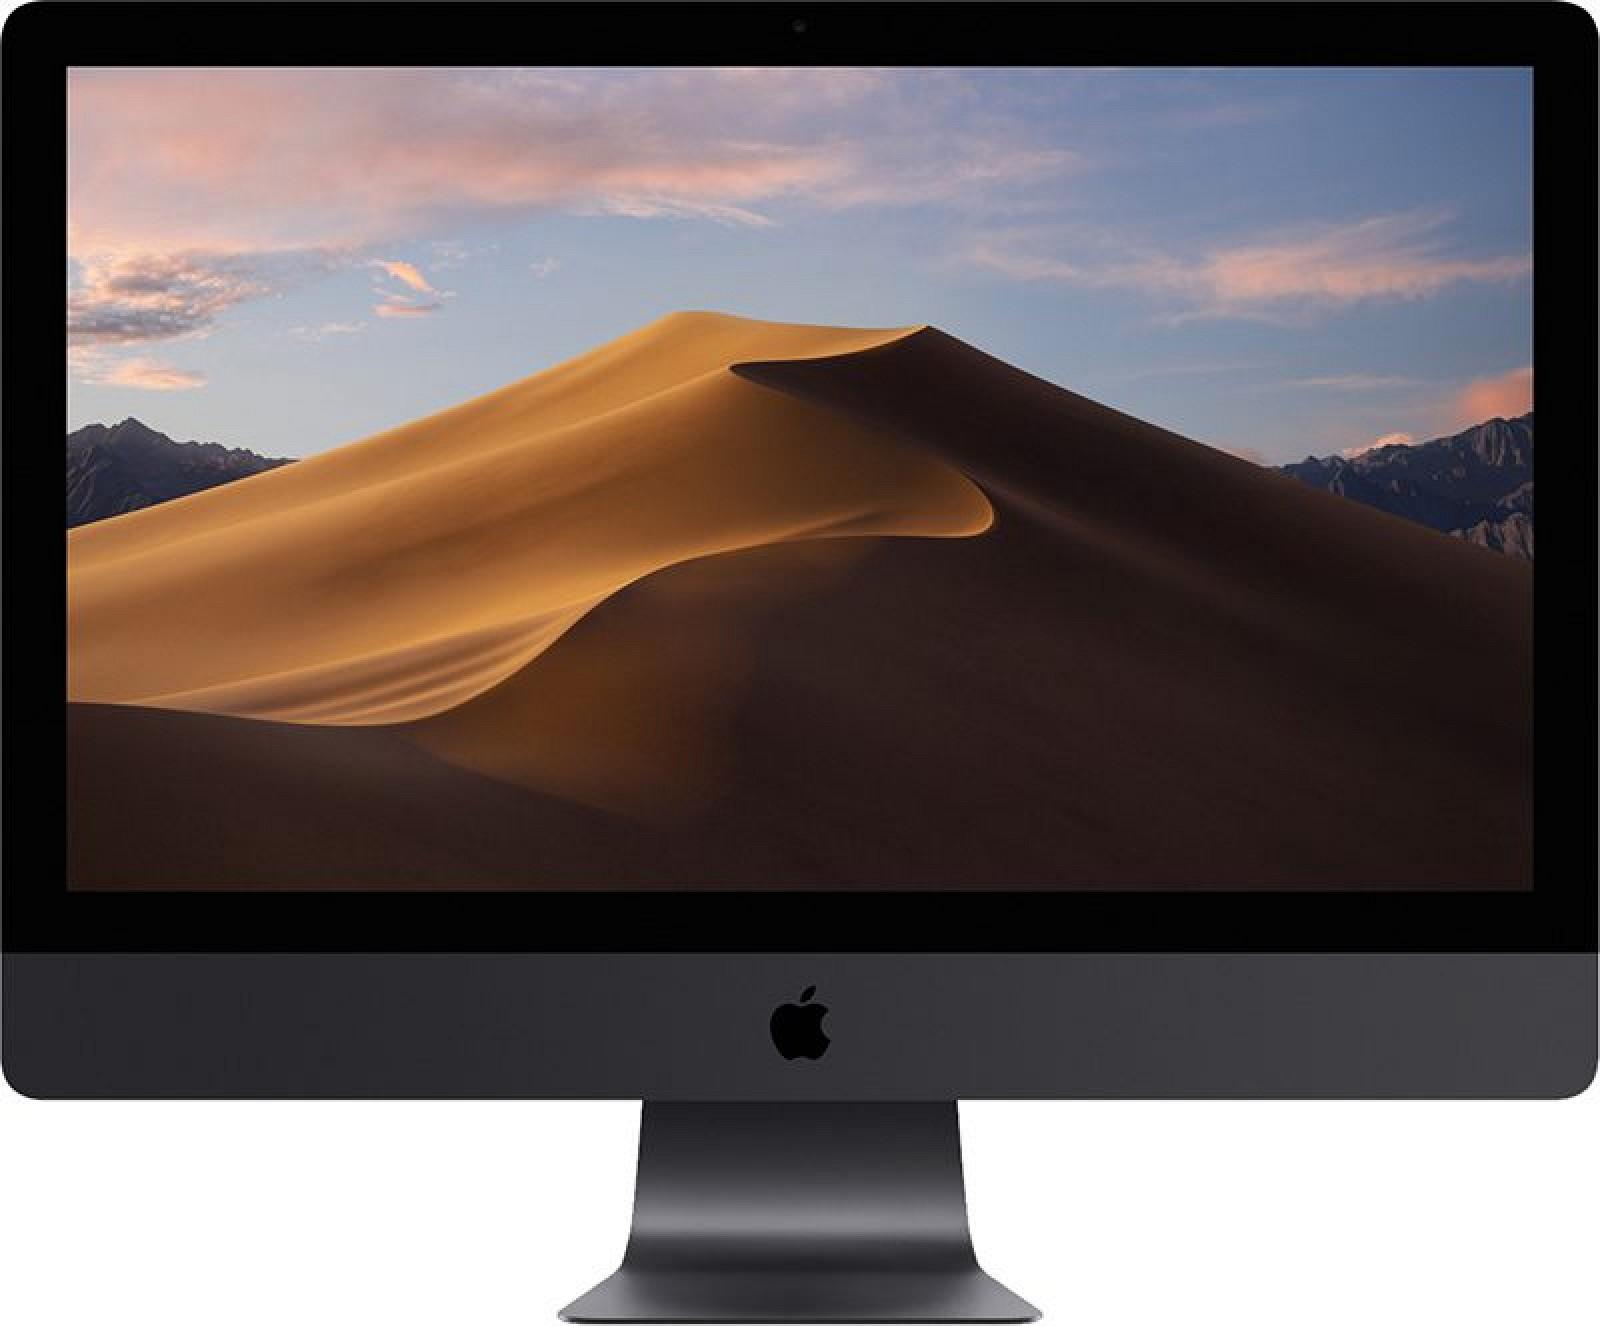 macOS Mojave: Dark Mode, Stacks, & More